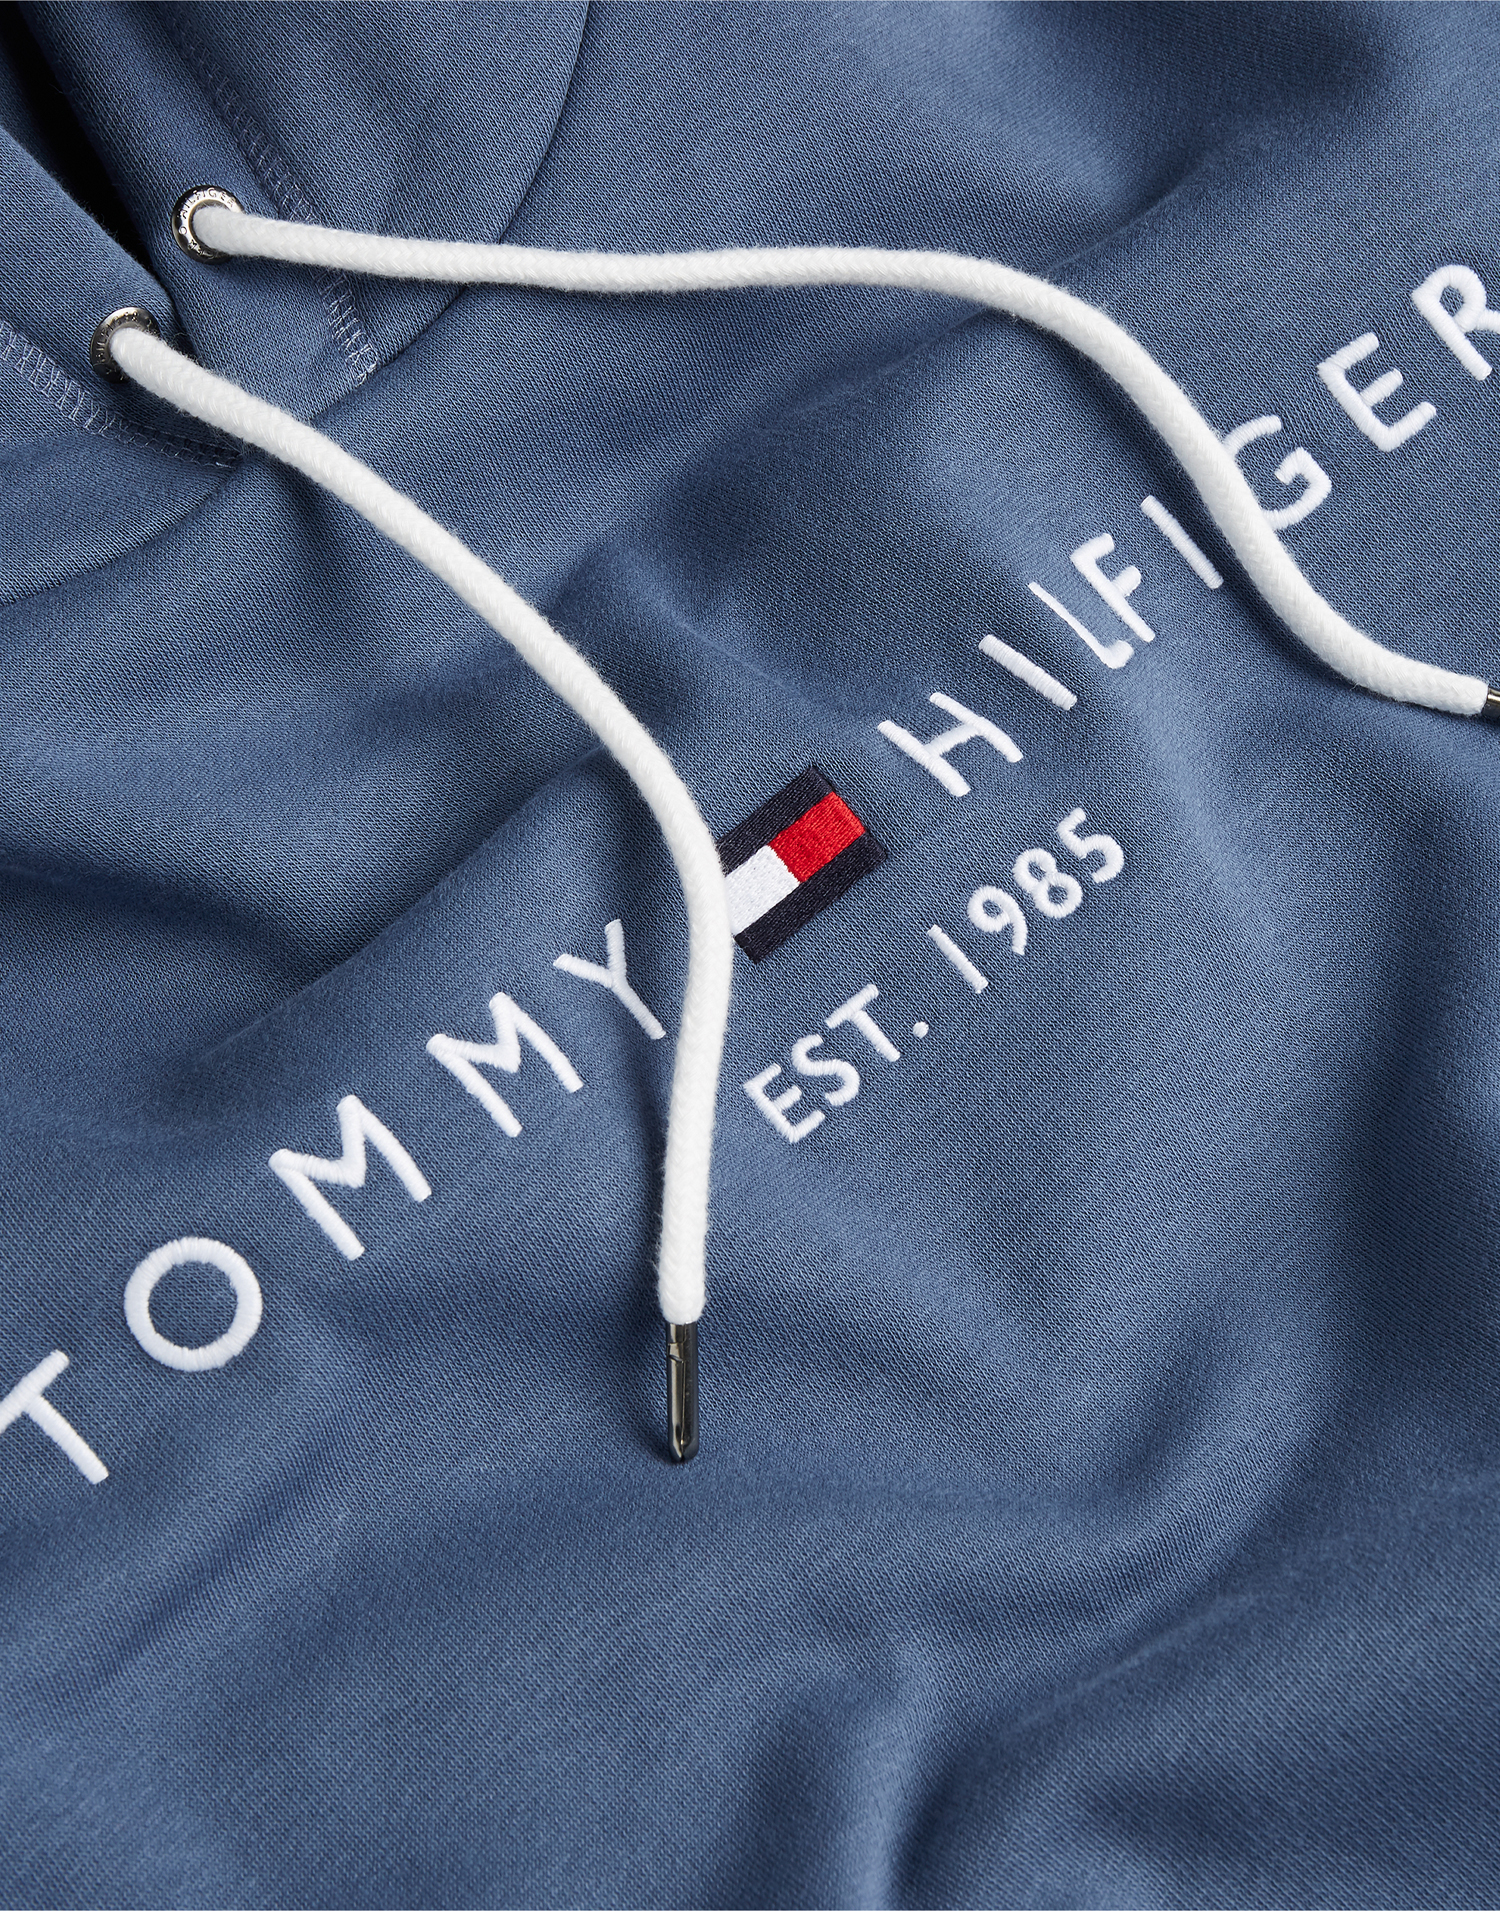 tommy hilfiger promo code ireland